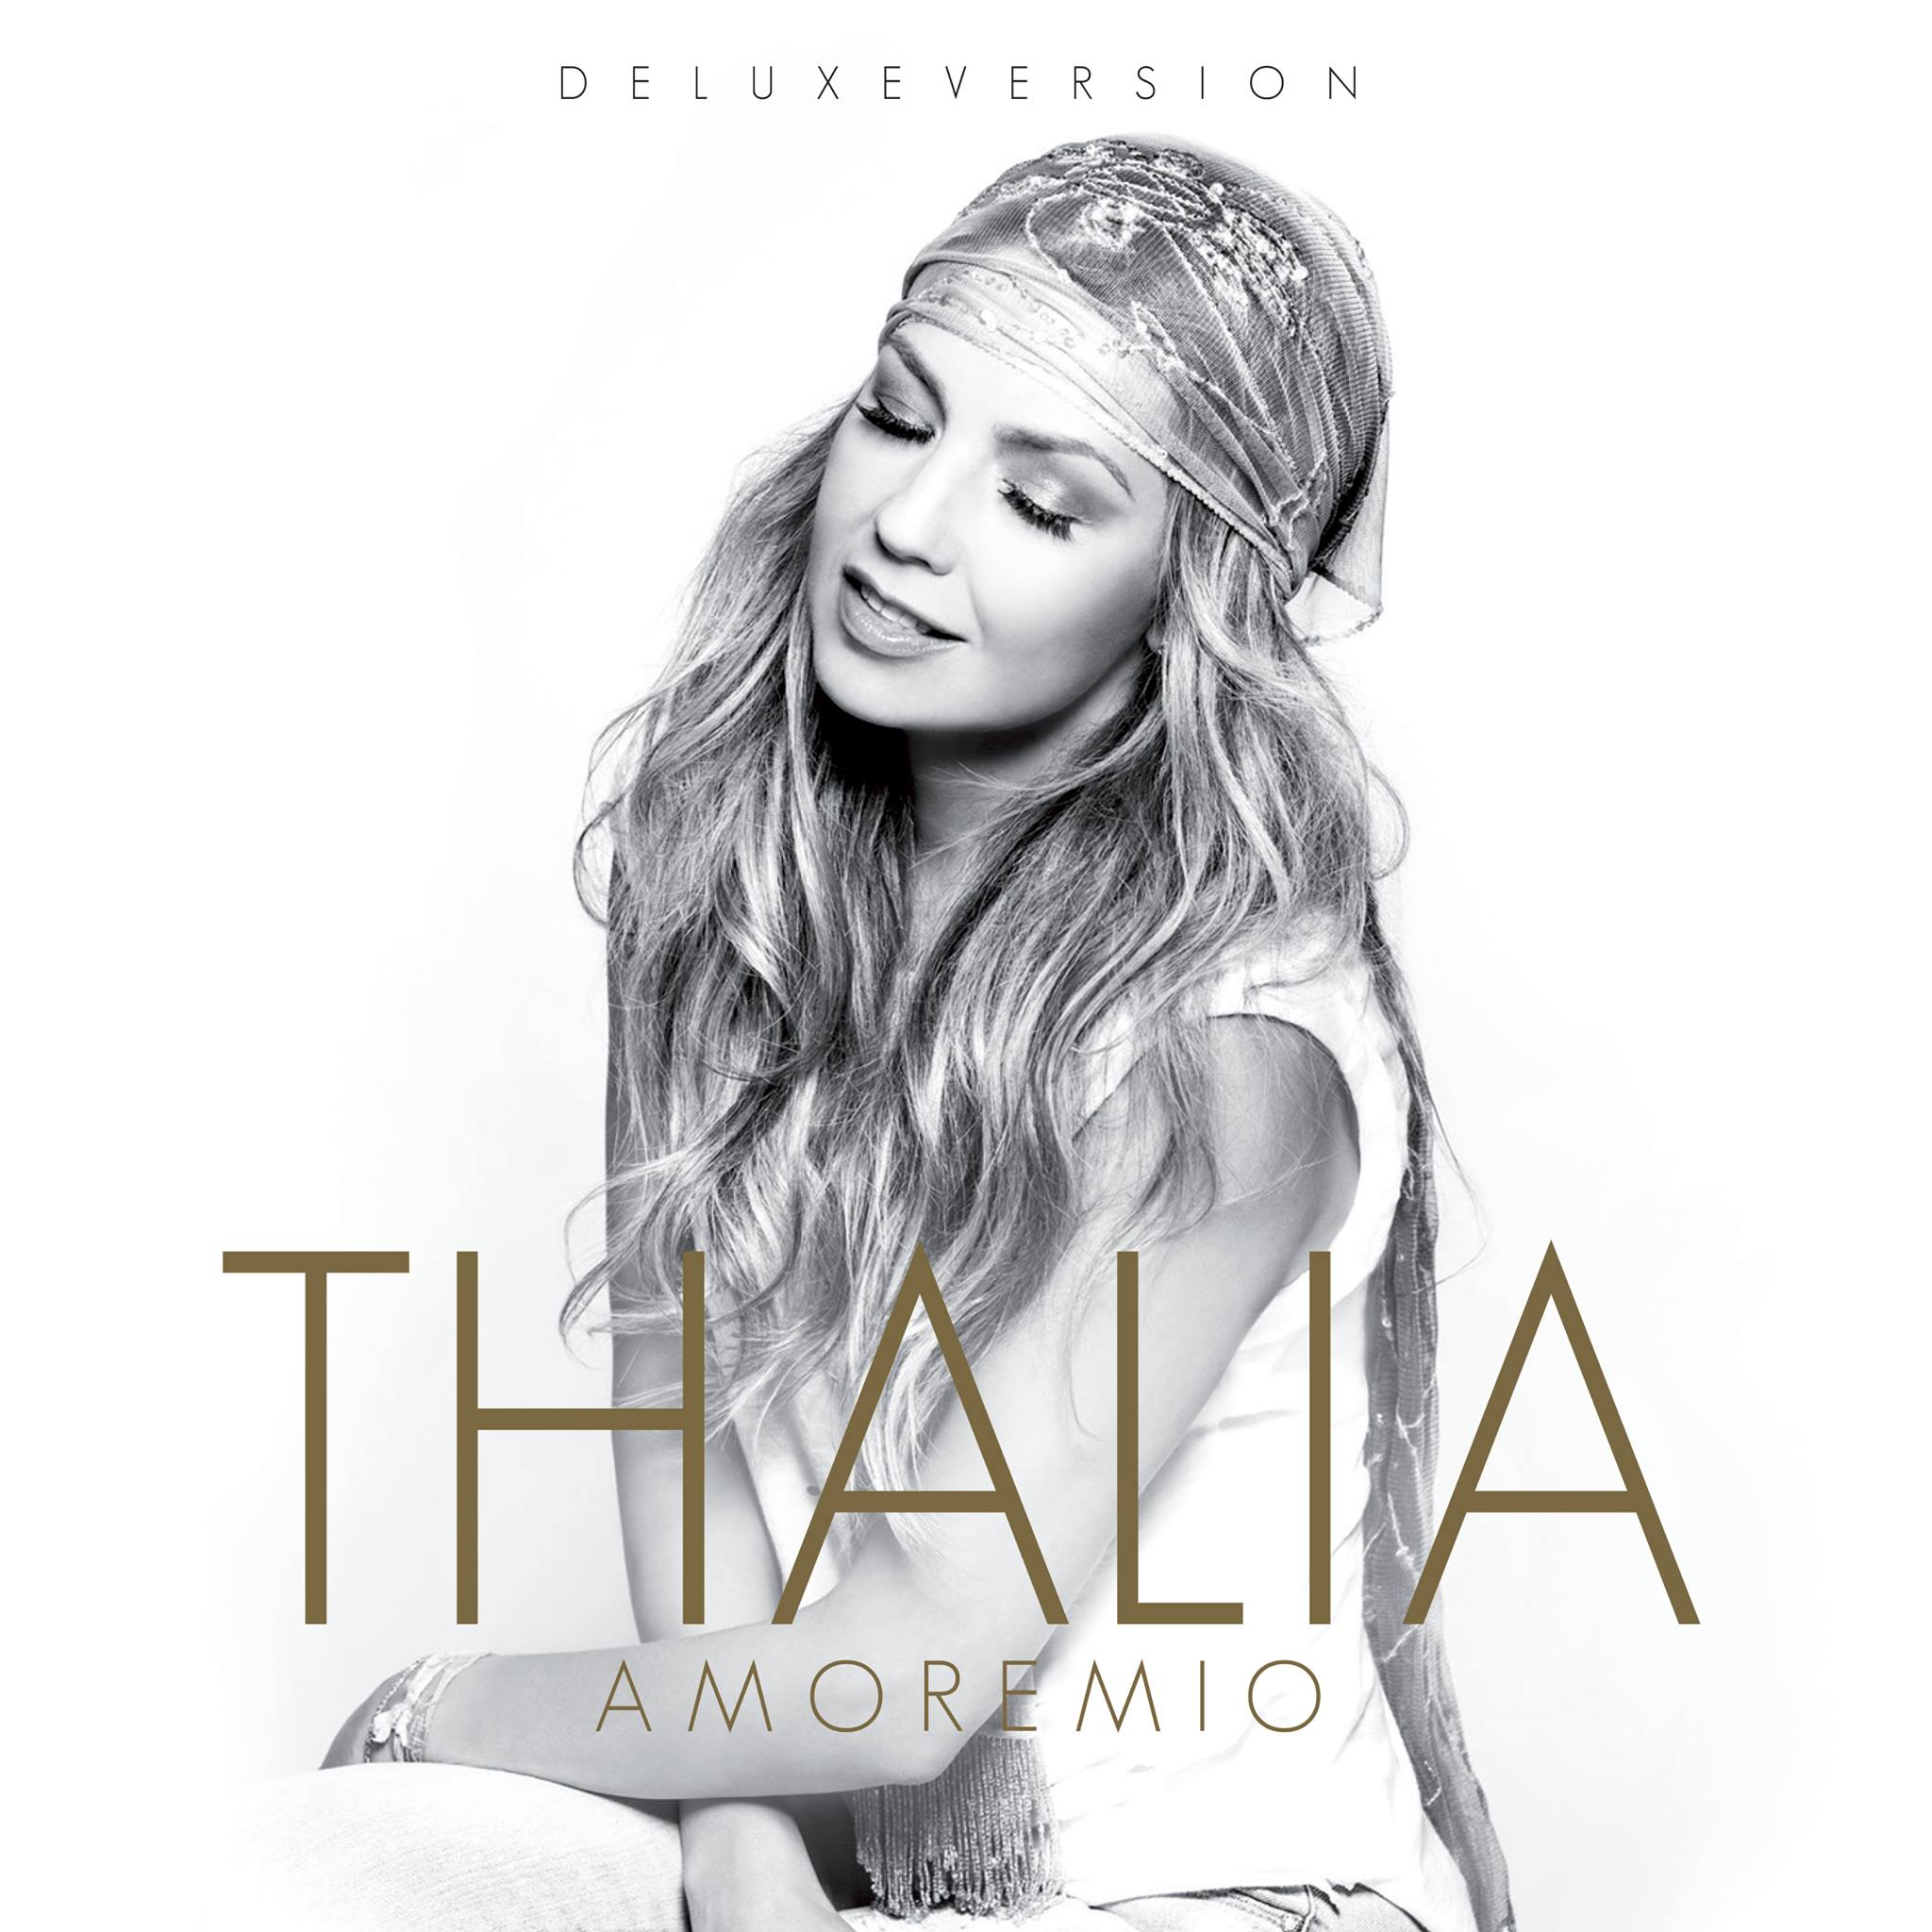 thalia-amore-mio-deluxe